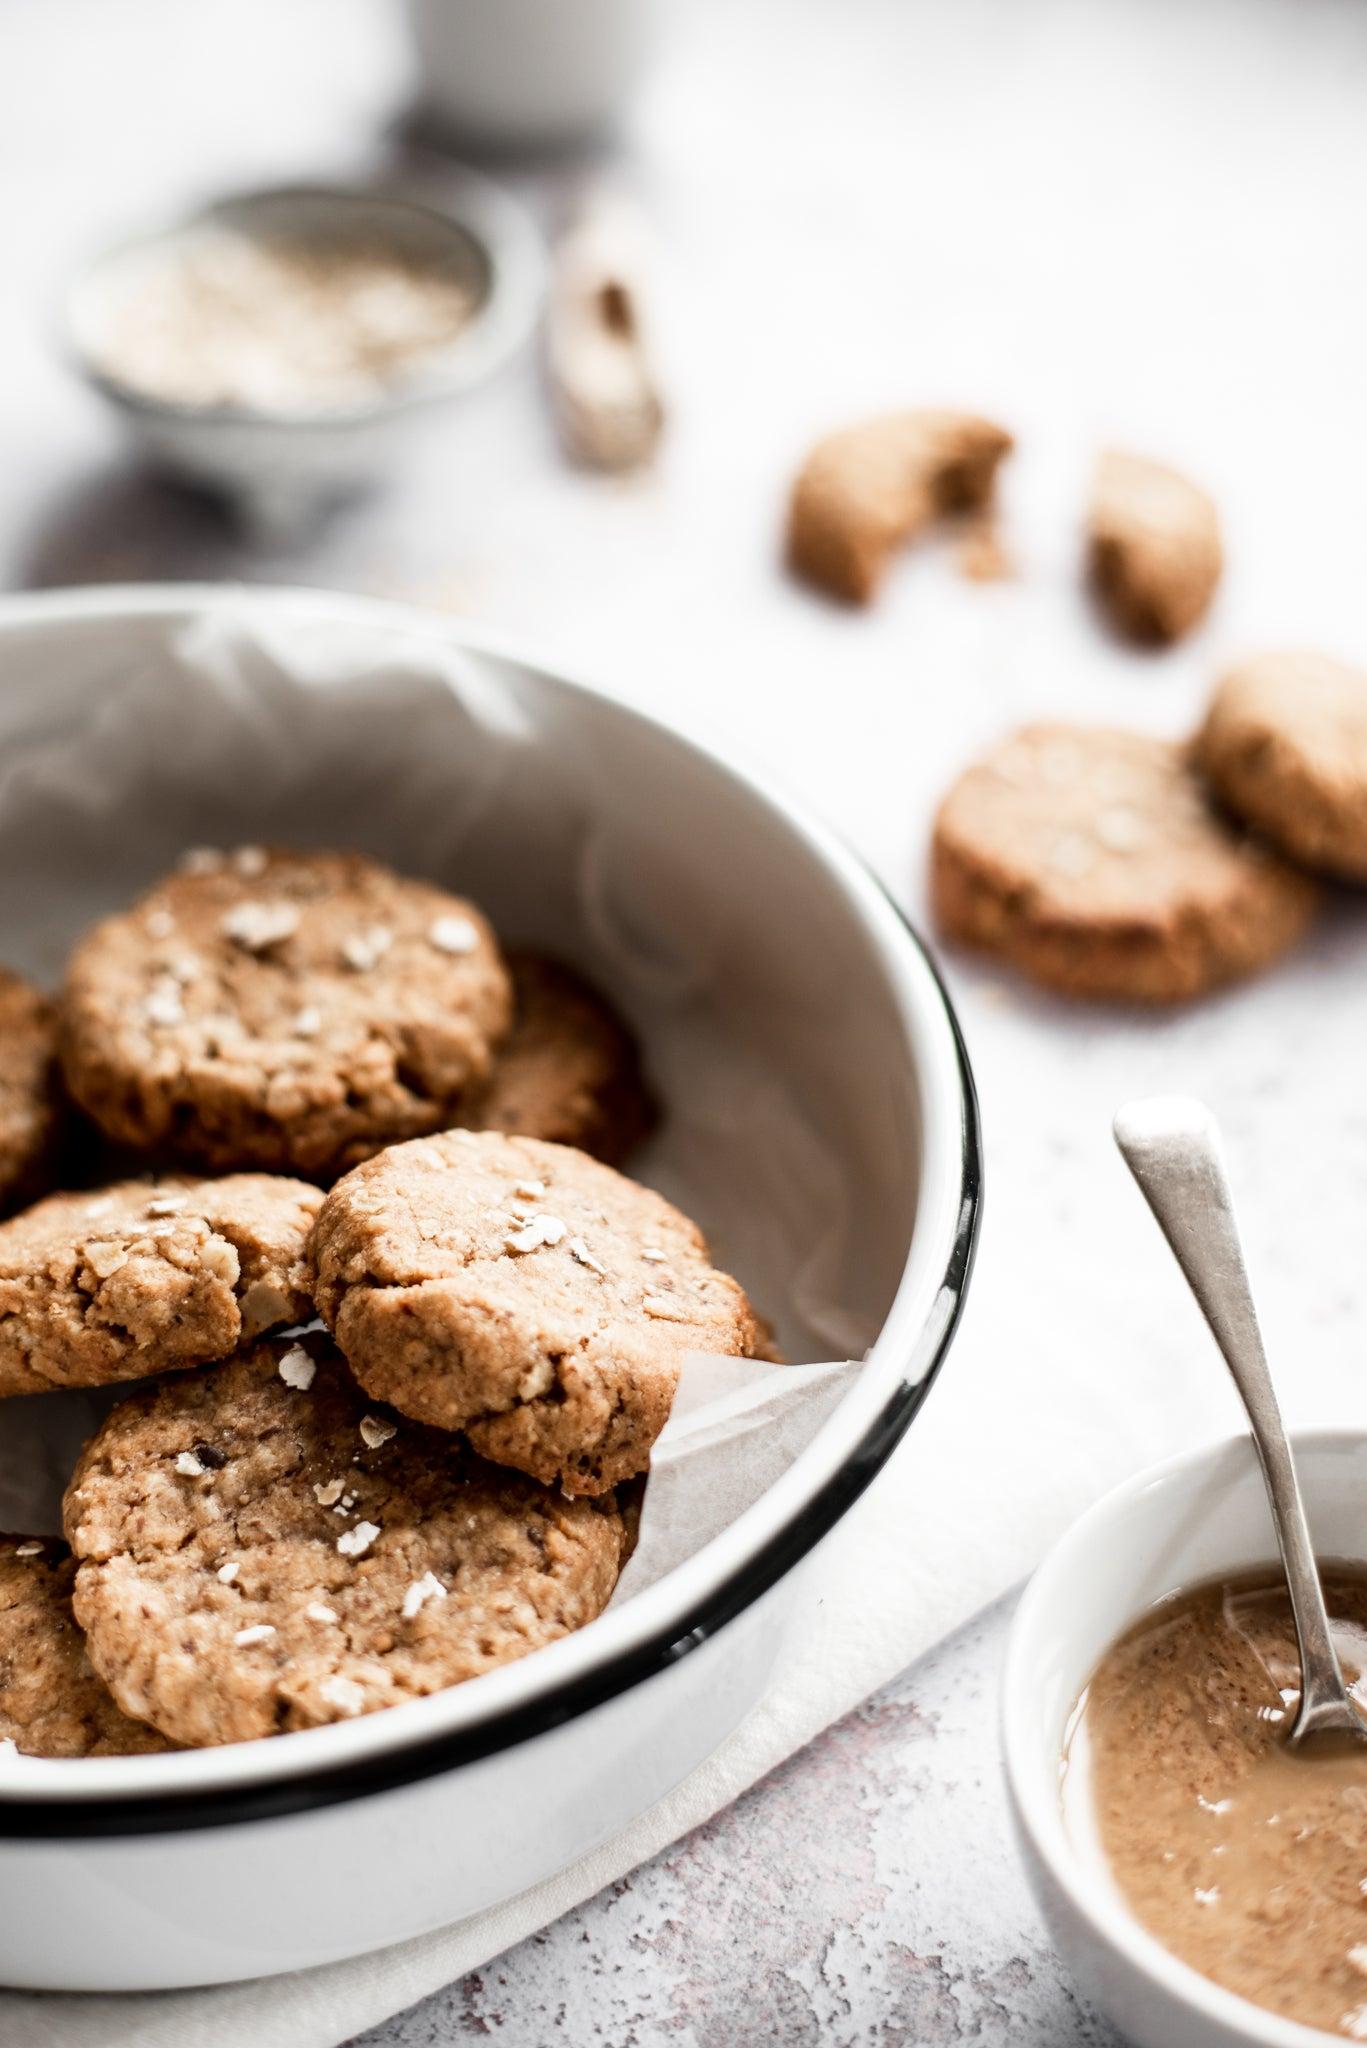 Gluten-Free-And-Vegan-Almond-Butter-Cookies-WEB-RES-6.jpg